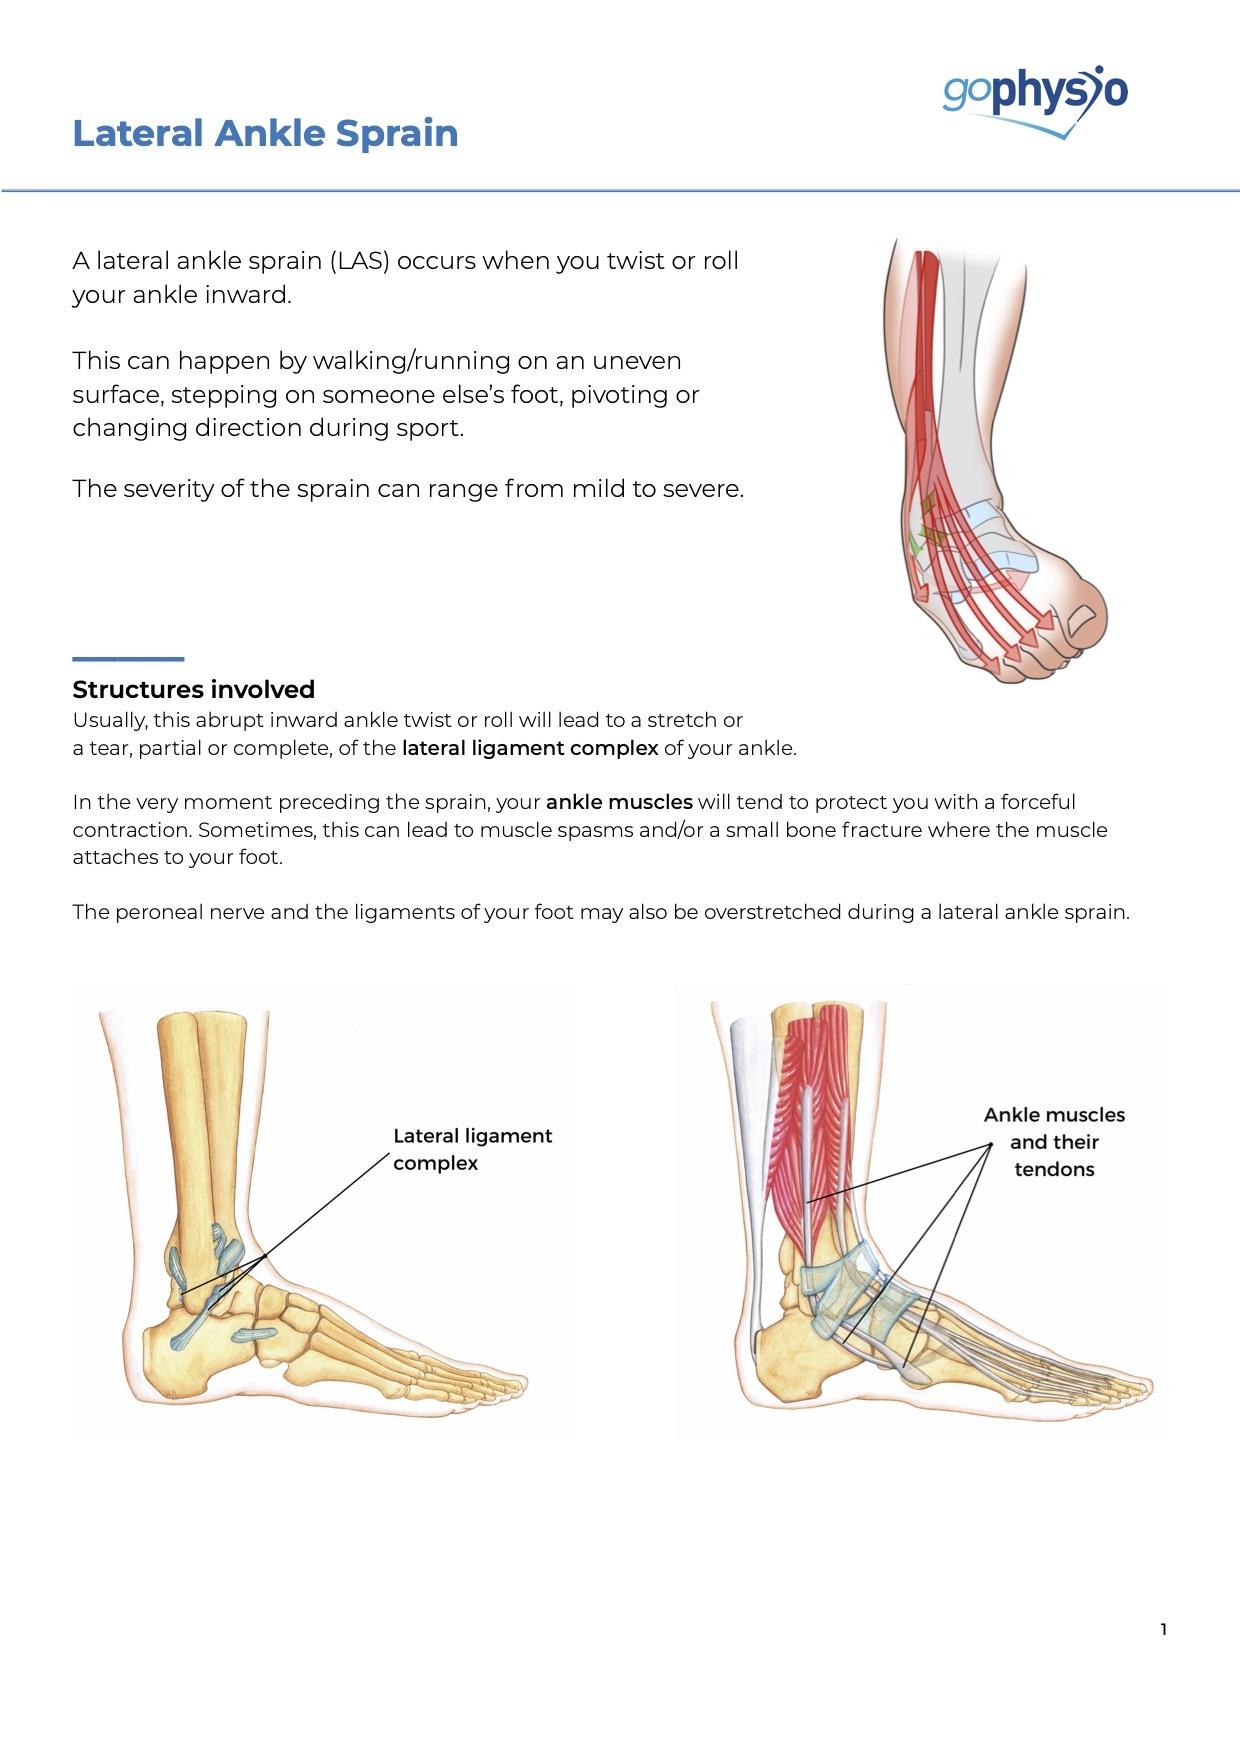 Lateral ankle sprain treatment goPhysio